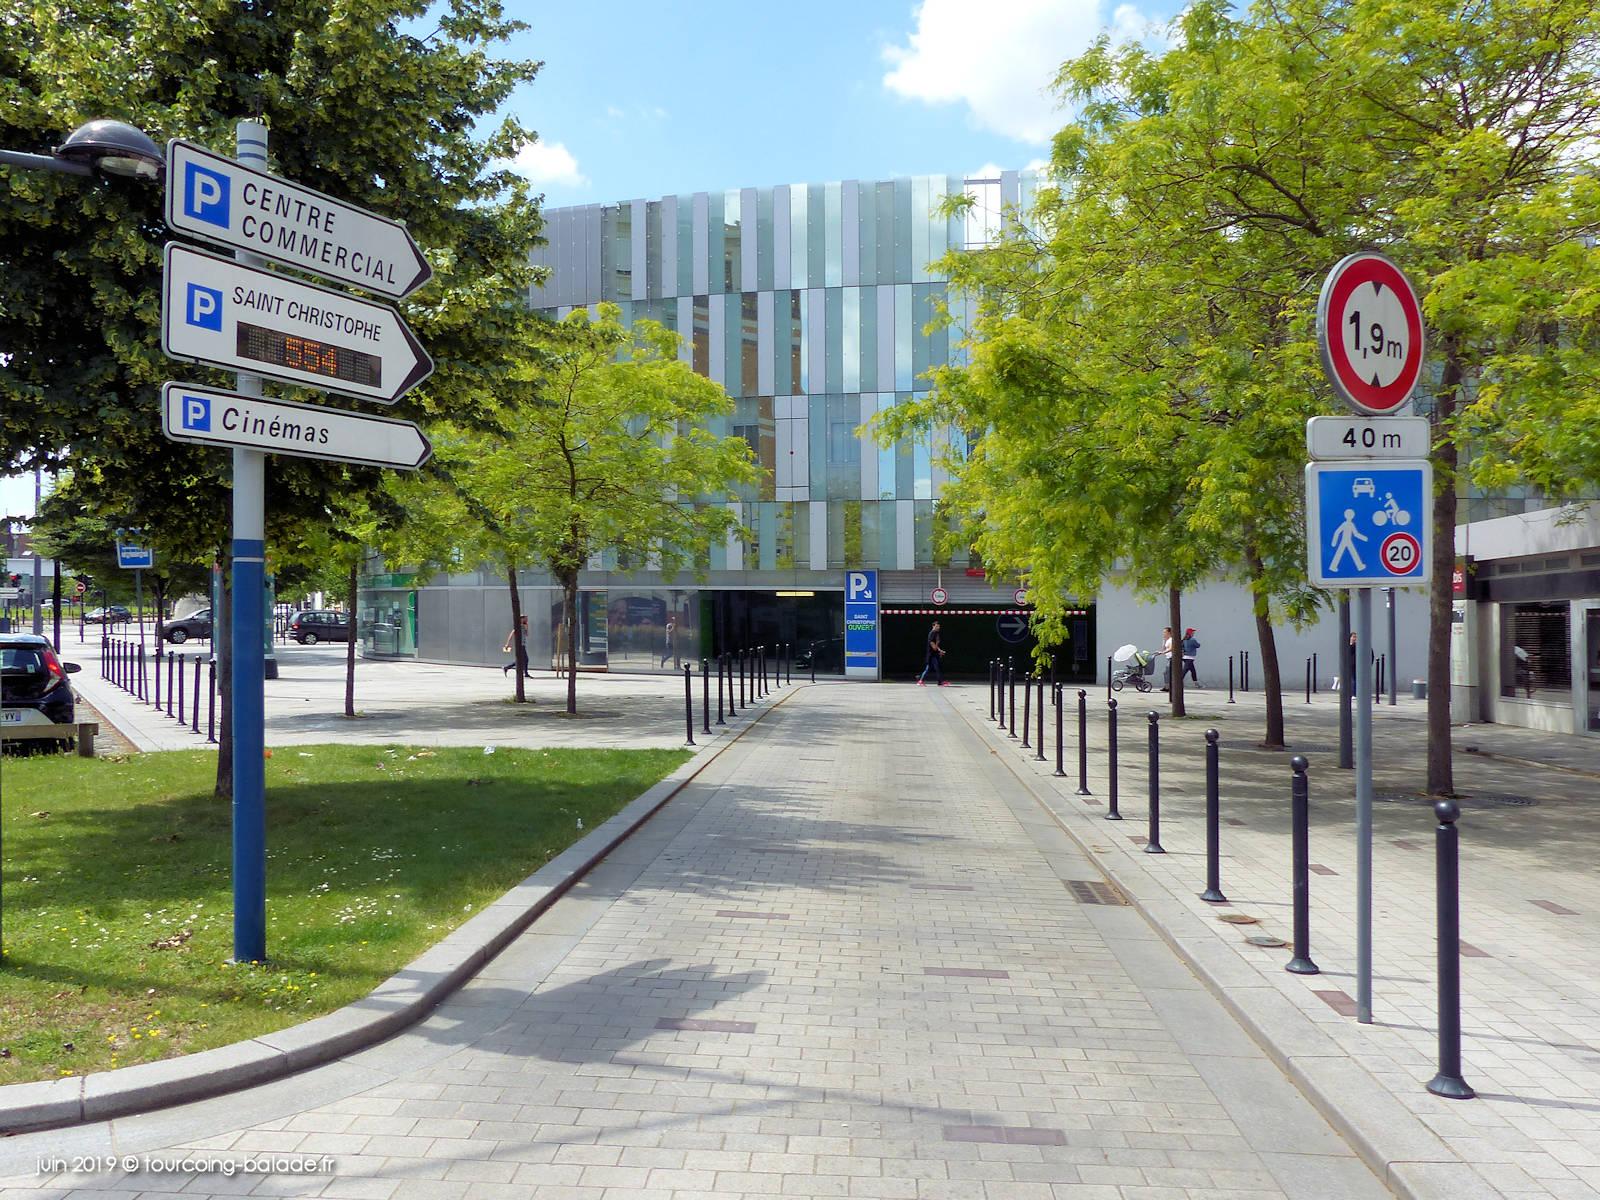 Accès véhicules Parking Saint-Christophe, Tourcoing 2019